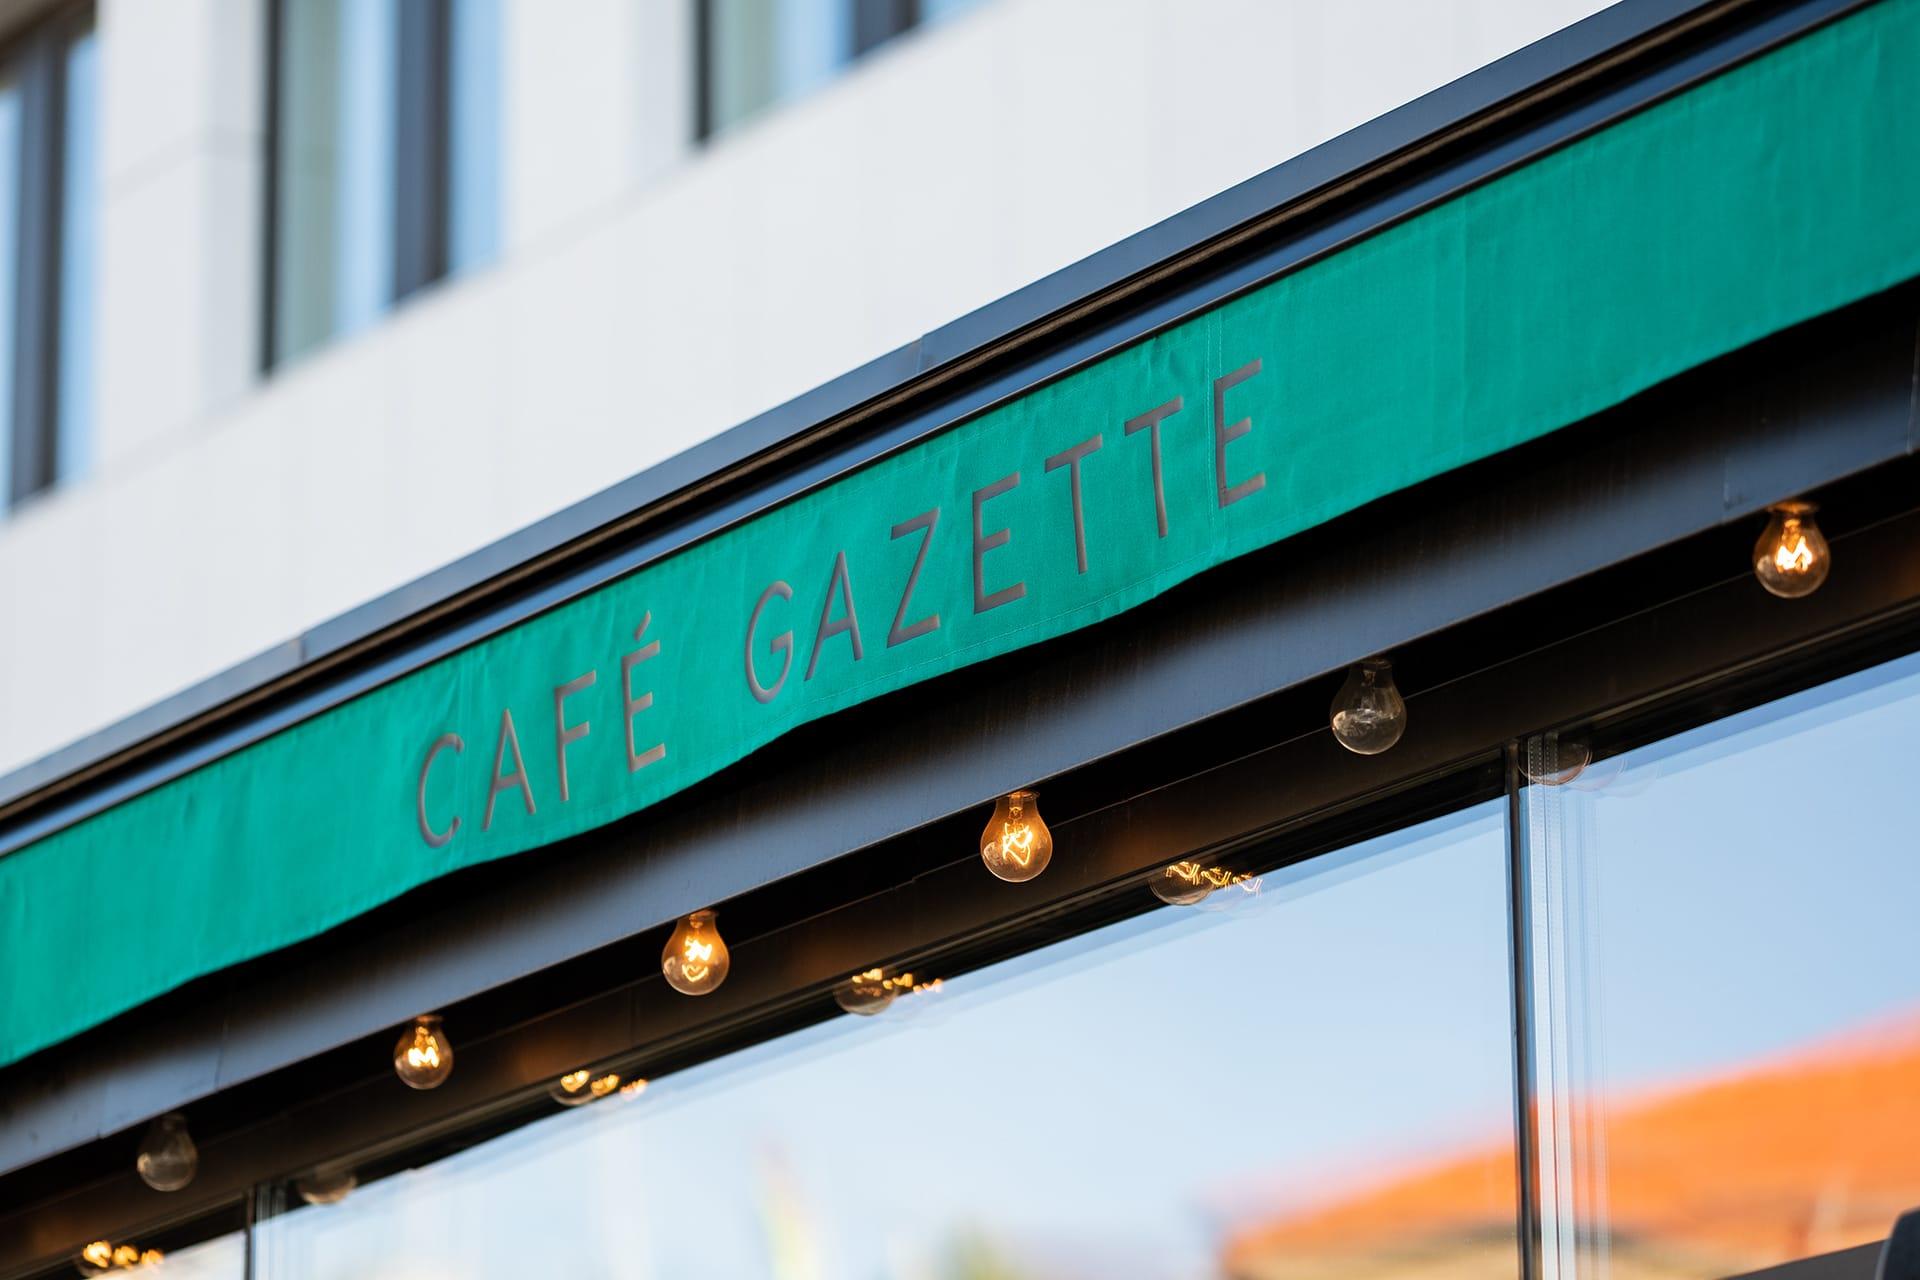 Zamenhof_Cafe_Gazette_Interior_Fotografi_mnecander-2